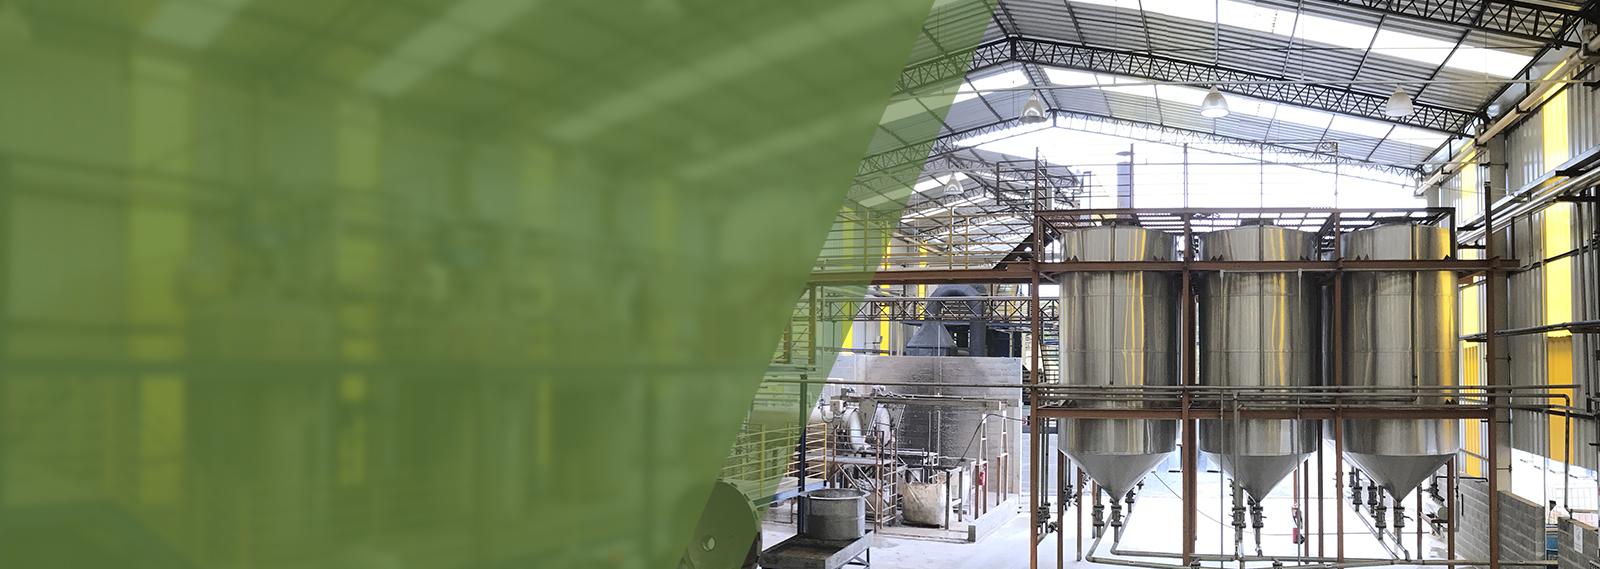 Capacidade instalada <br /> de 36.000 toneladas de <br /> Goma Resina por ano<br />